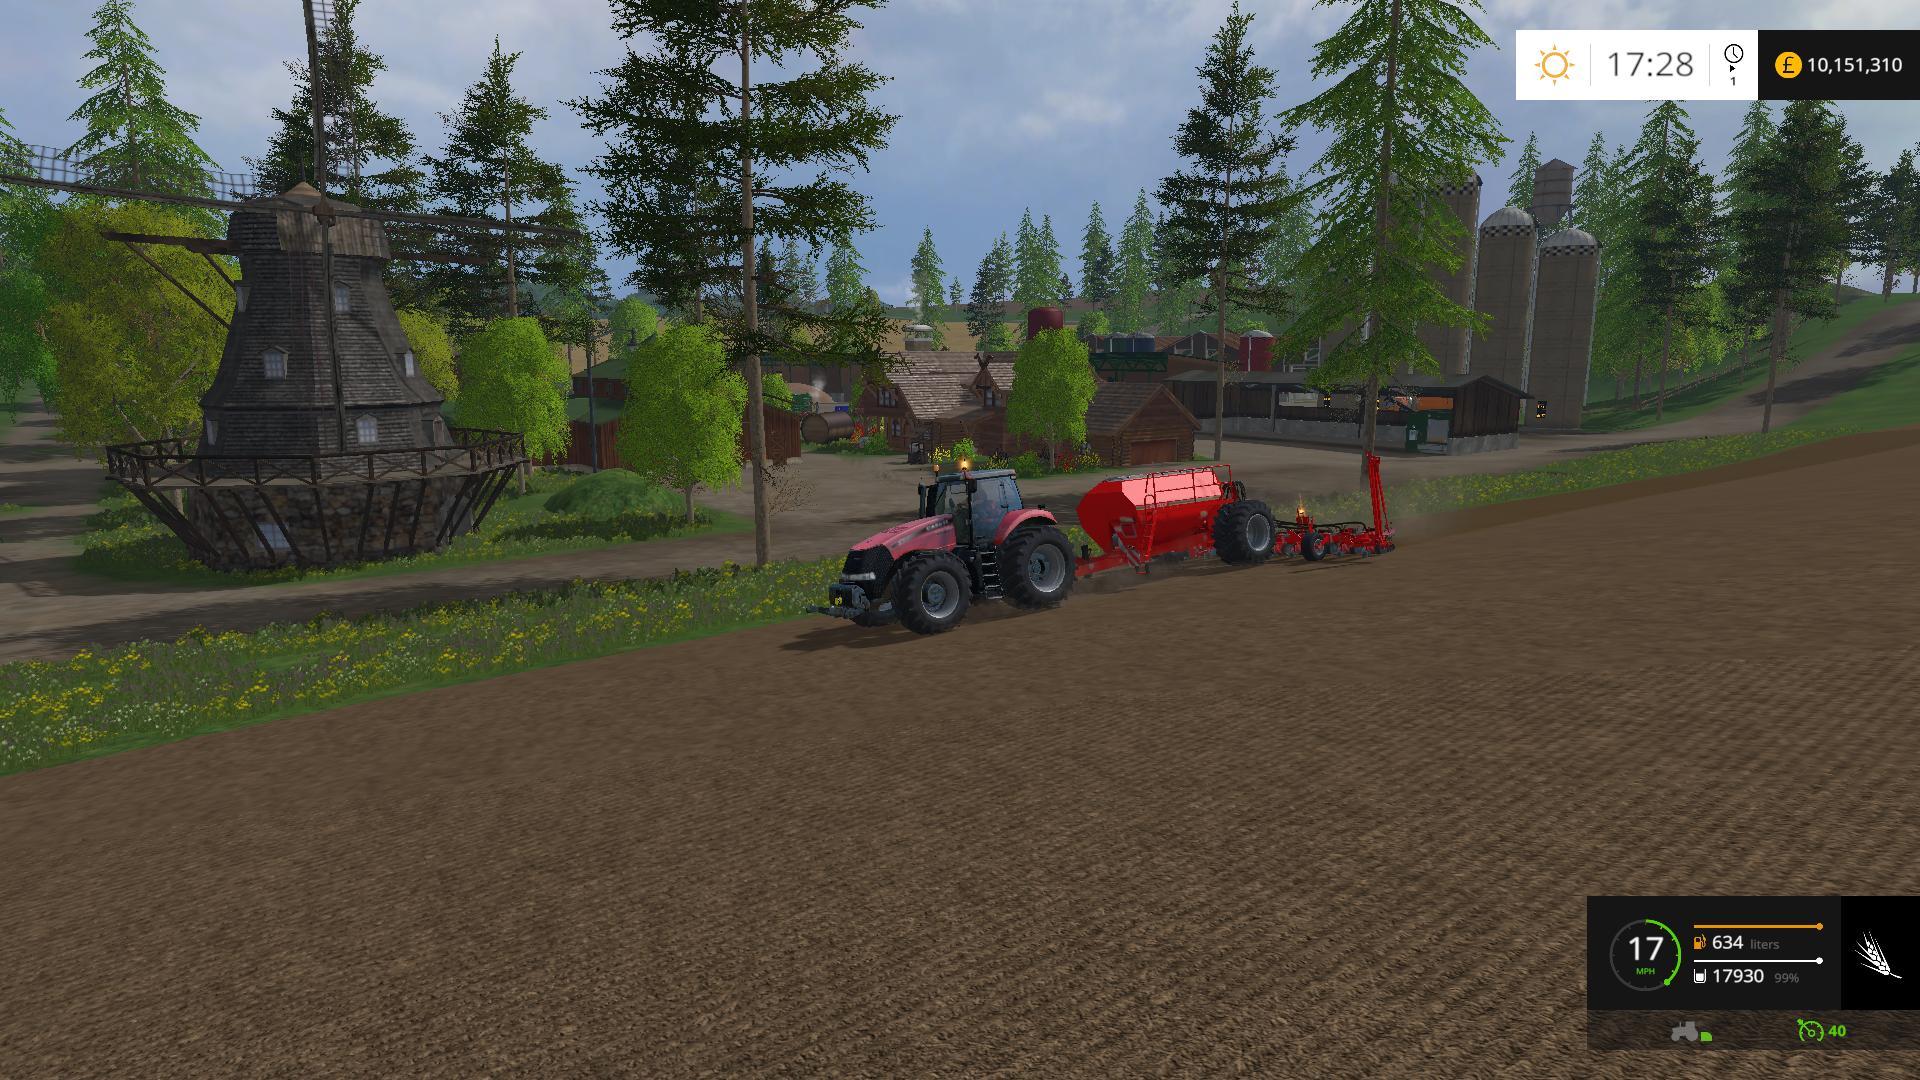 RINGWOODS V3 DUAL MAPS BY STEVIE • Farming simulator 19, 17, 15 mods on